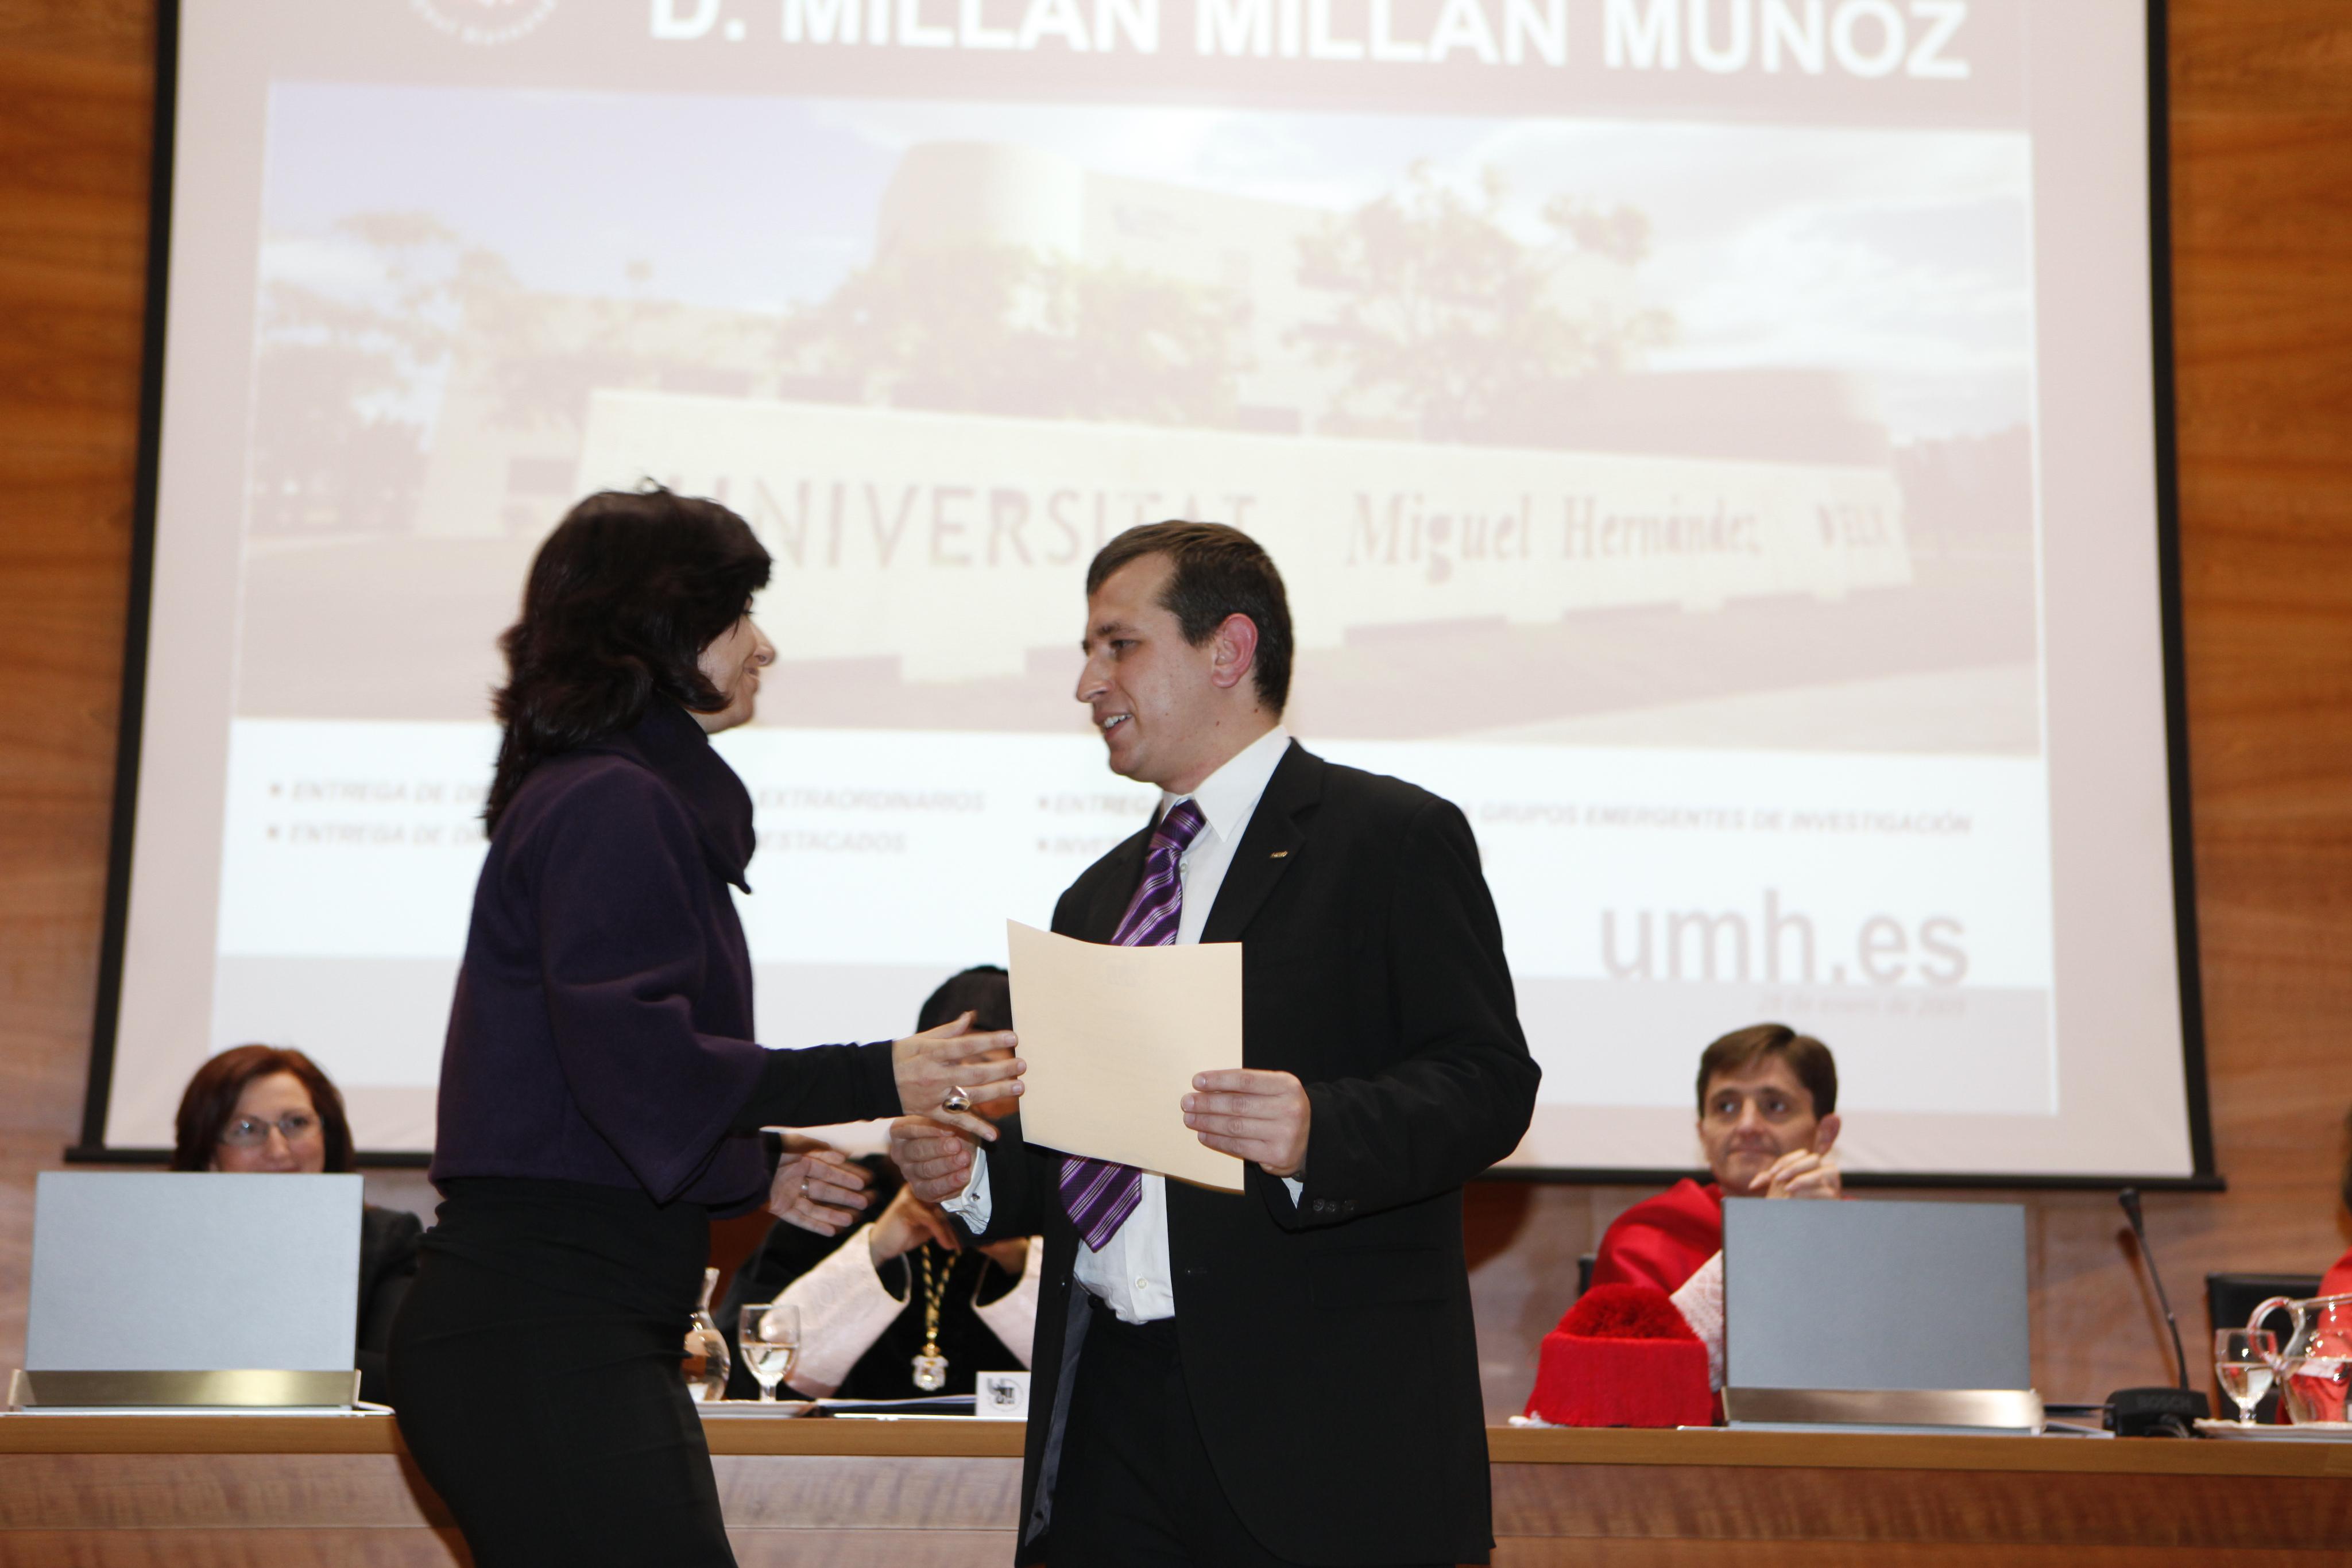 Entrega Diplomas_mg_5227.jpg